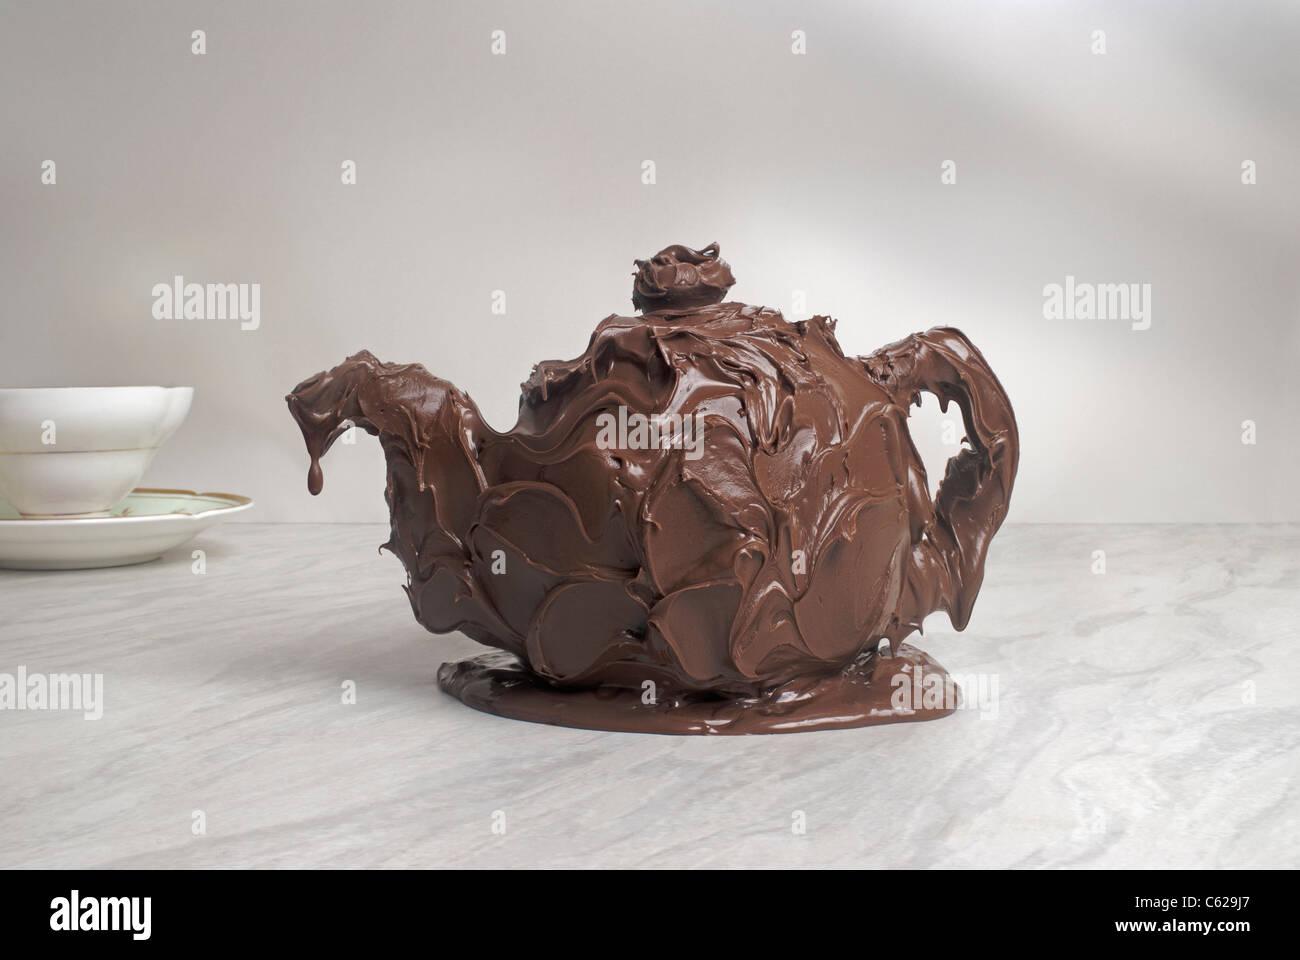 Teapot made of chocolate - Stock Image